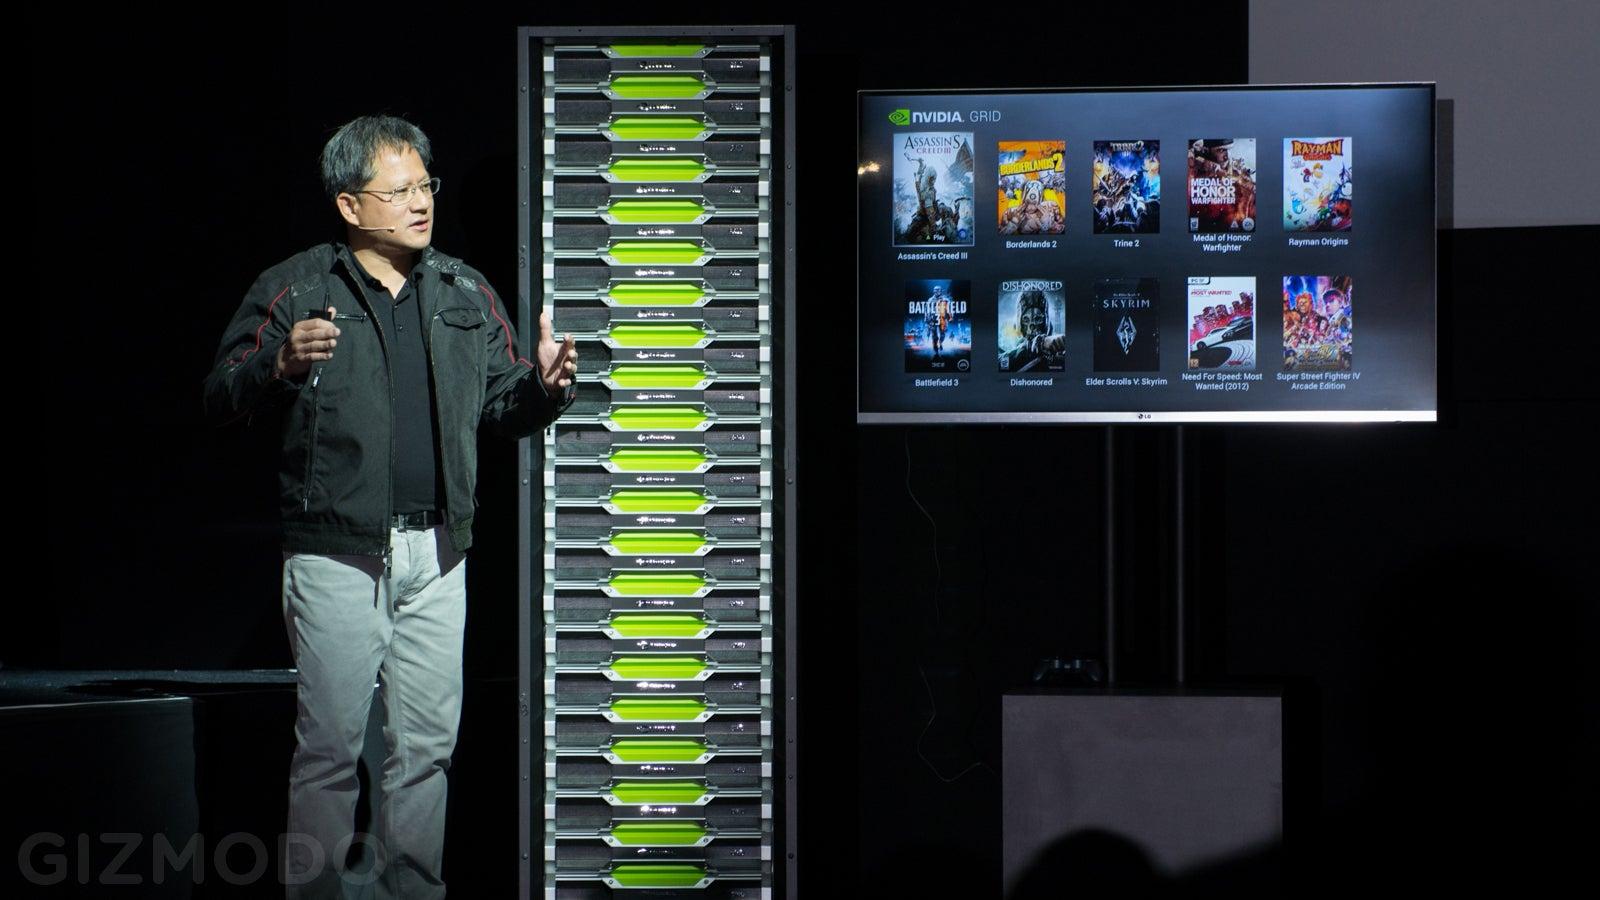 nvidia just built its own gaming supercomputer  the grid